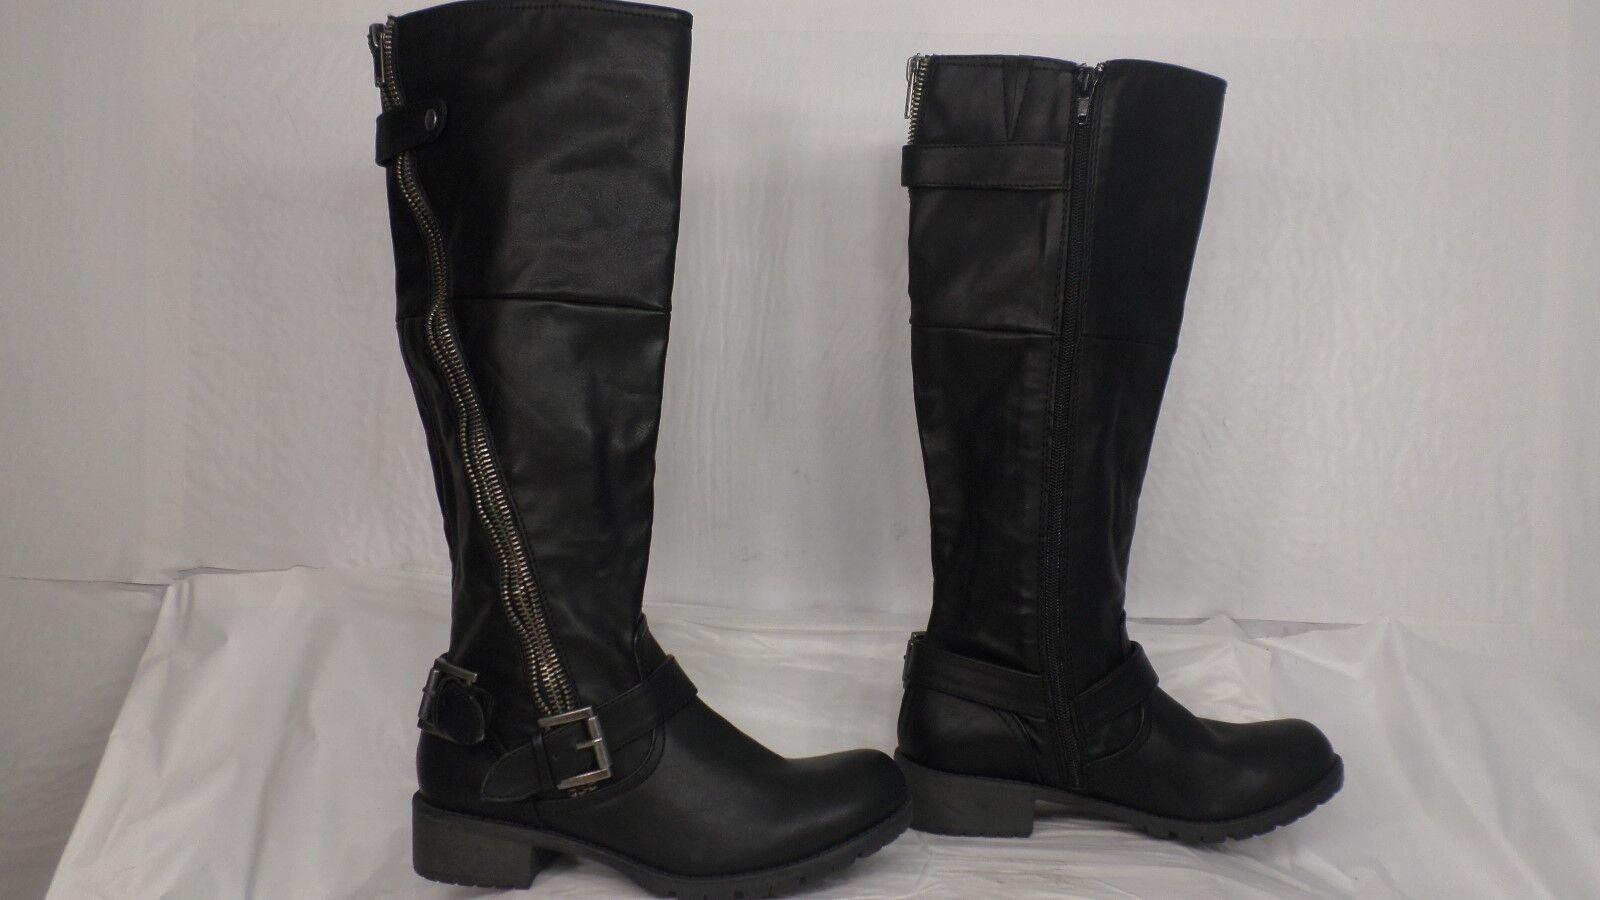 Zigi Soho 'Dakara' Black Faux Leather Knee High Motorcycle Boot Women Size 6 M